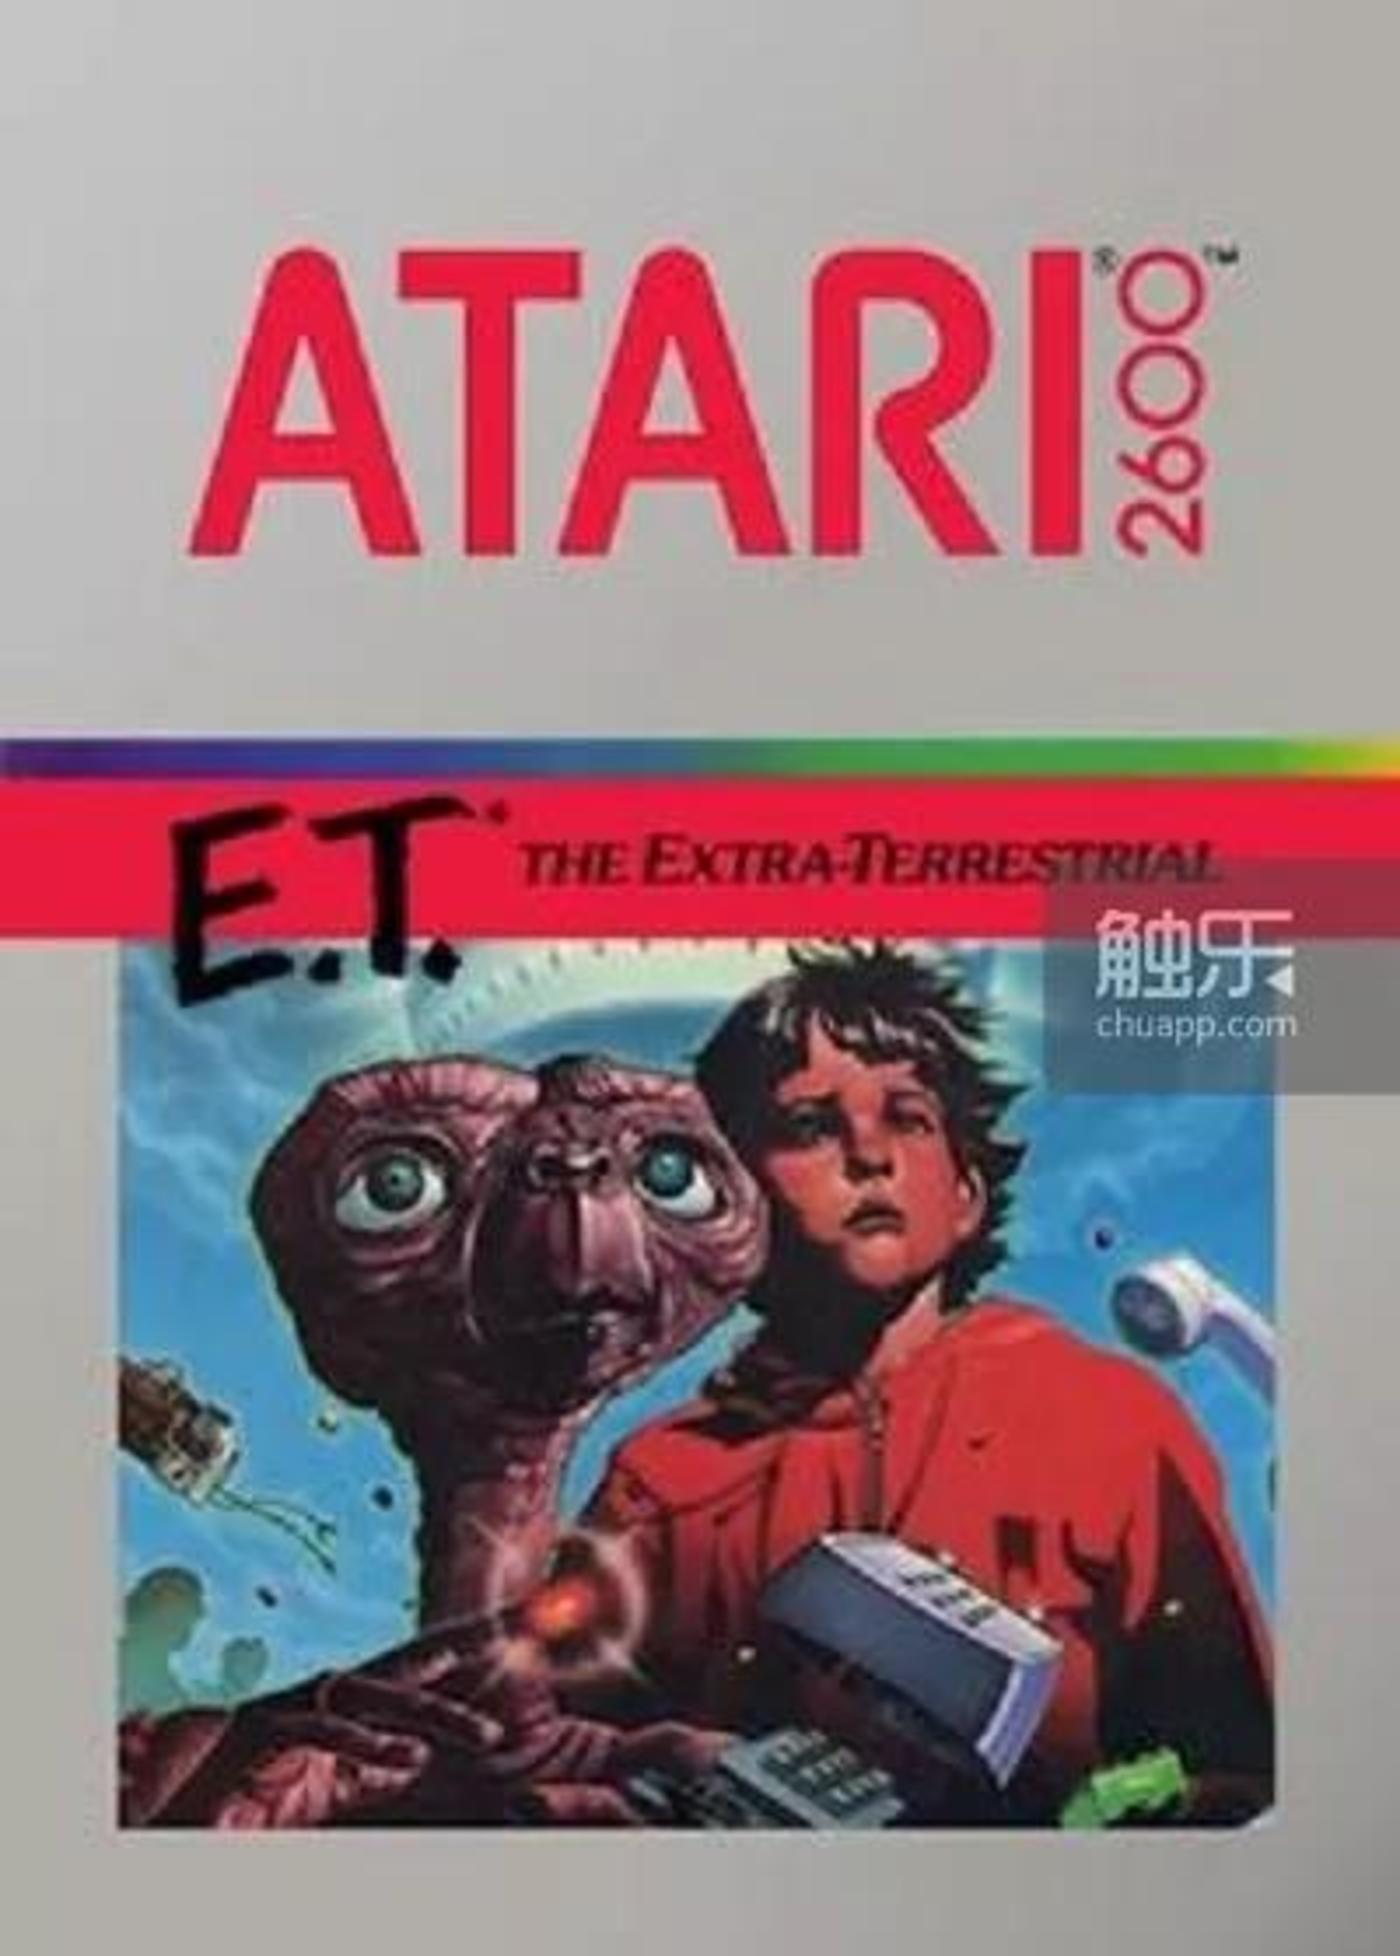 《E.T.》是雅达利帝国崩溃的标志